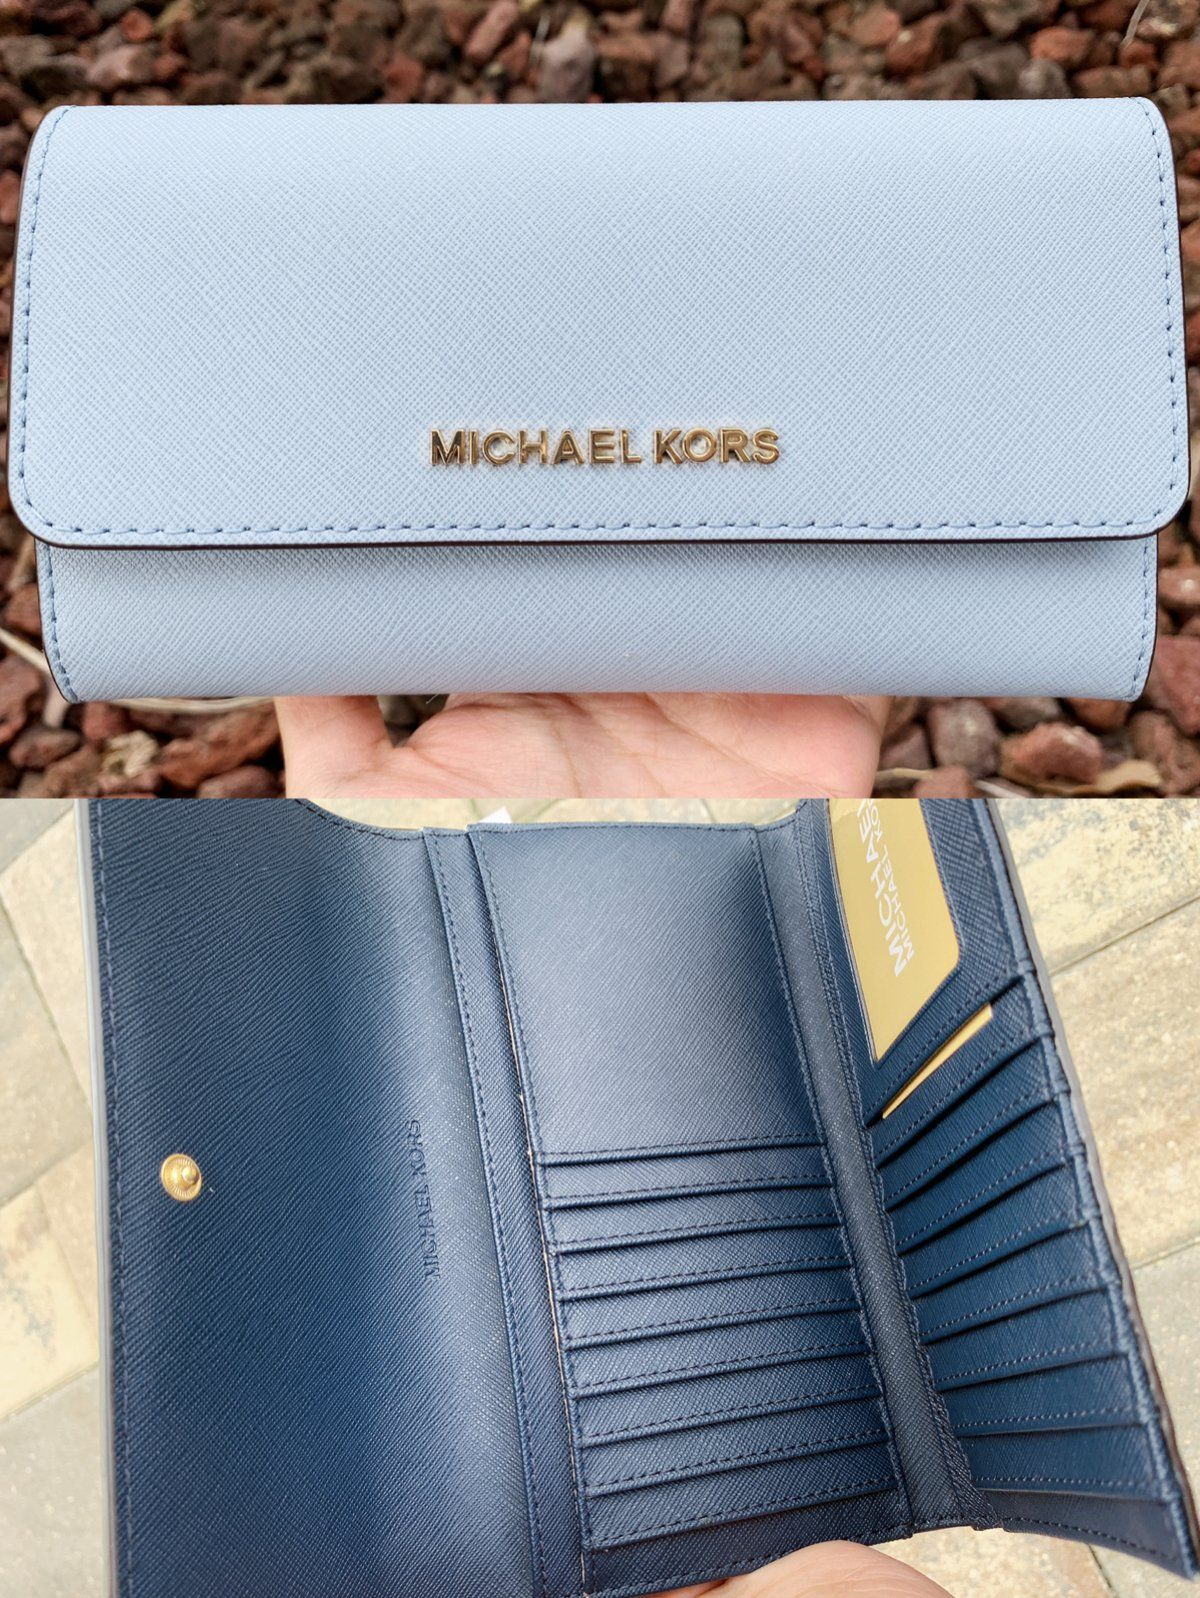 fb665447c7f6 Michael Kors Jet Set Travel Large Trifold Wallet Pale Blue Navy in ...